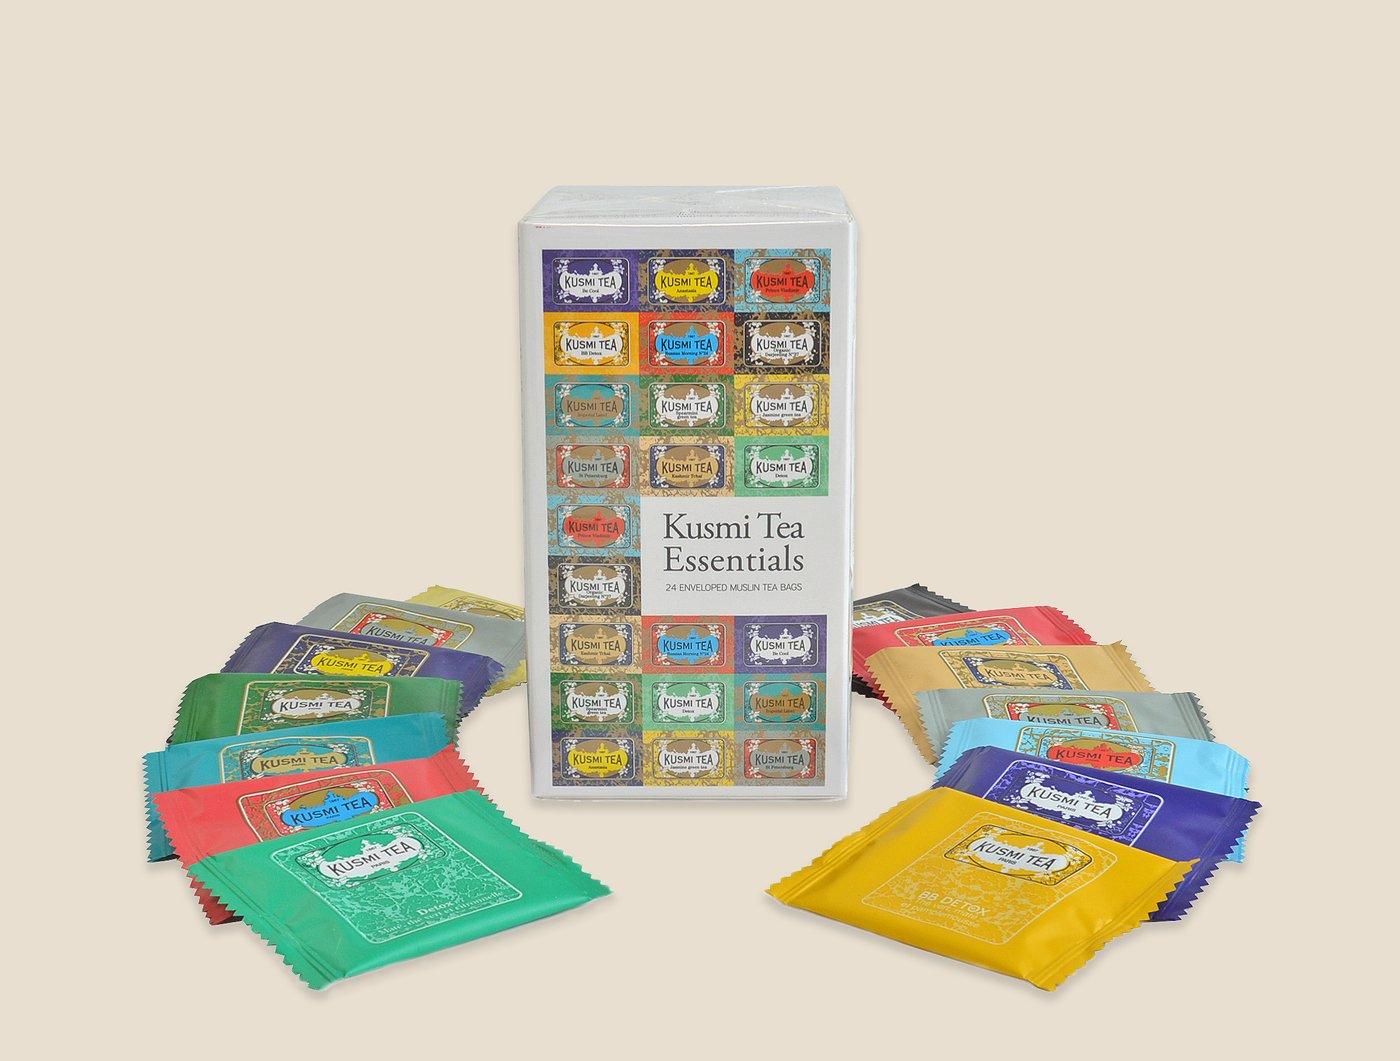 amazoncom kusmi tea essentials 24 tea bags grocery tea sampler grocery u0026 gourmet food